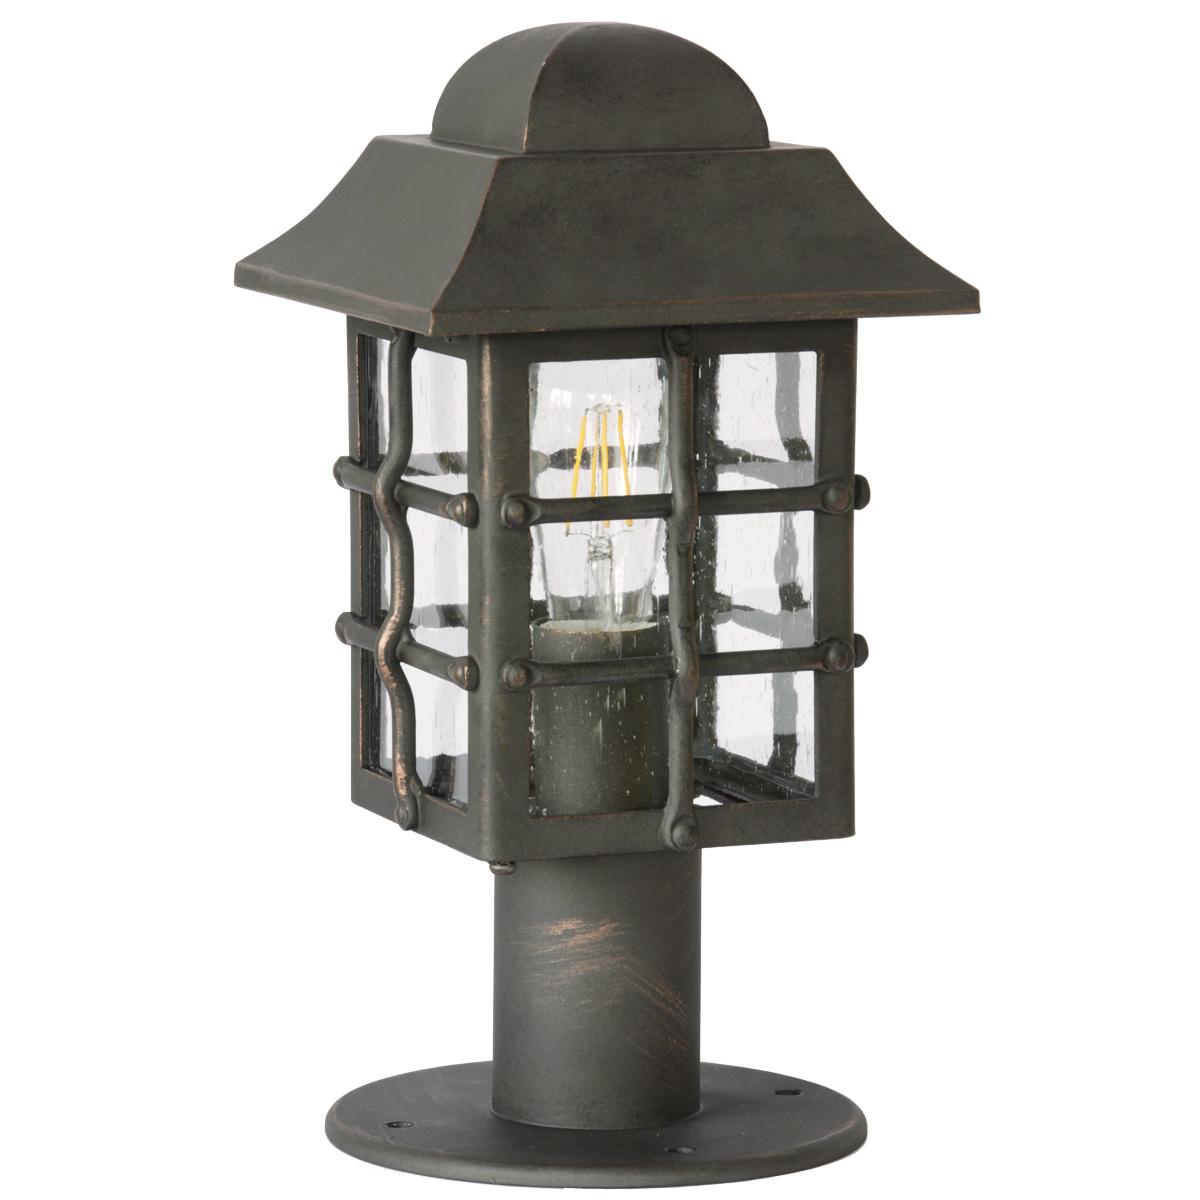 Wrought Iron Socket Light Al 6821 Terra Lumi